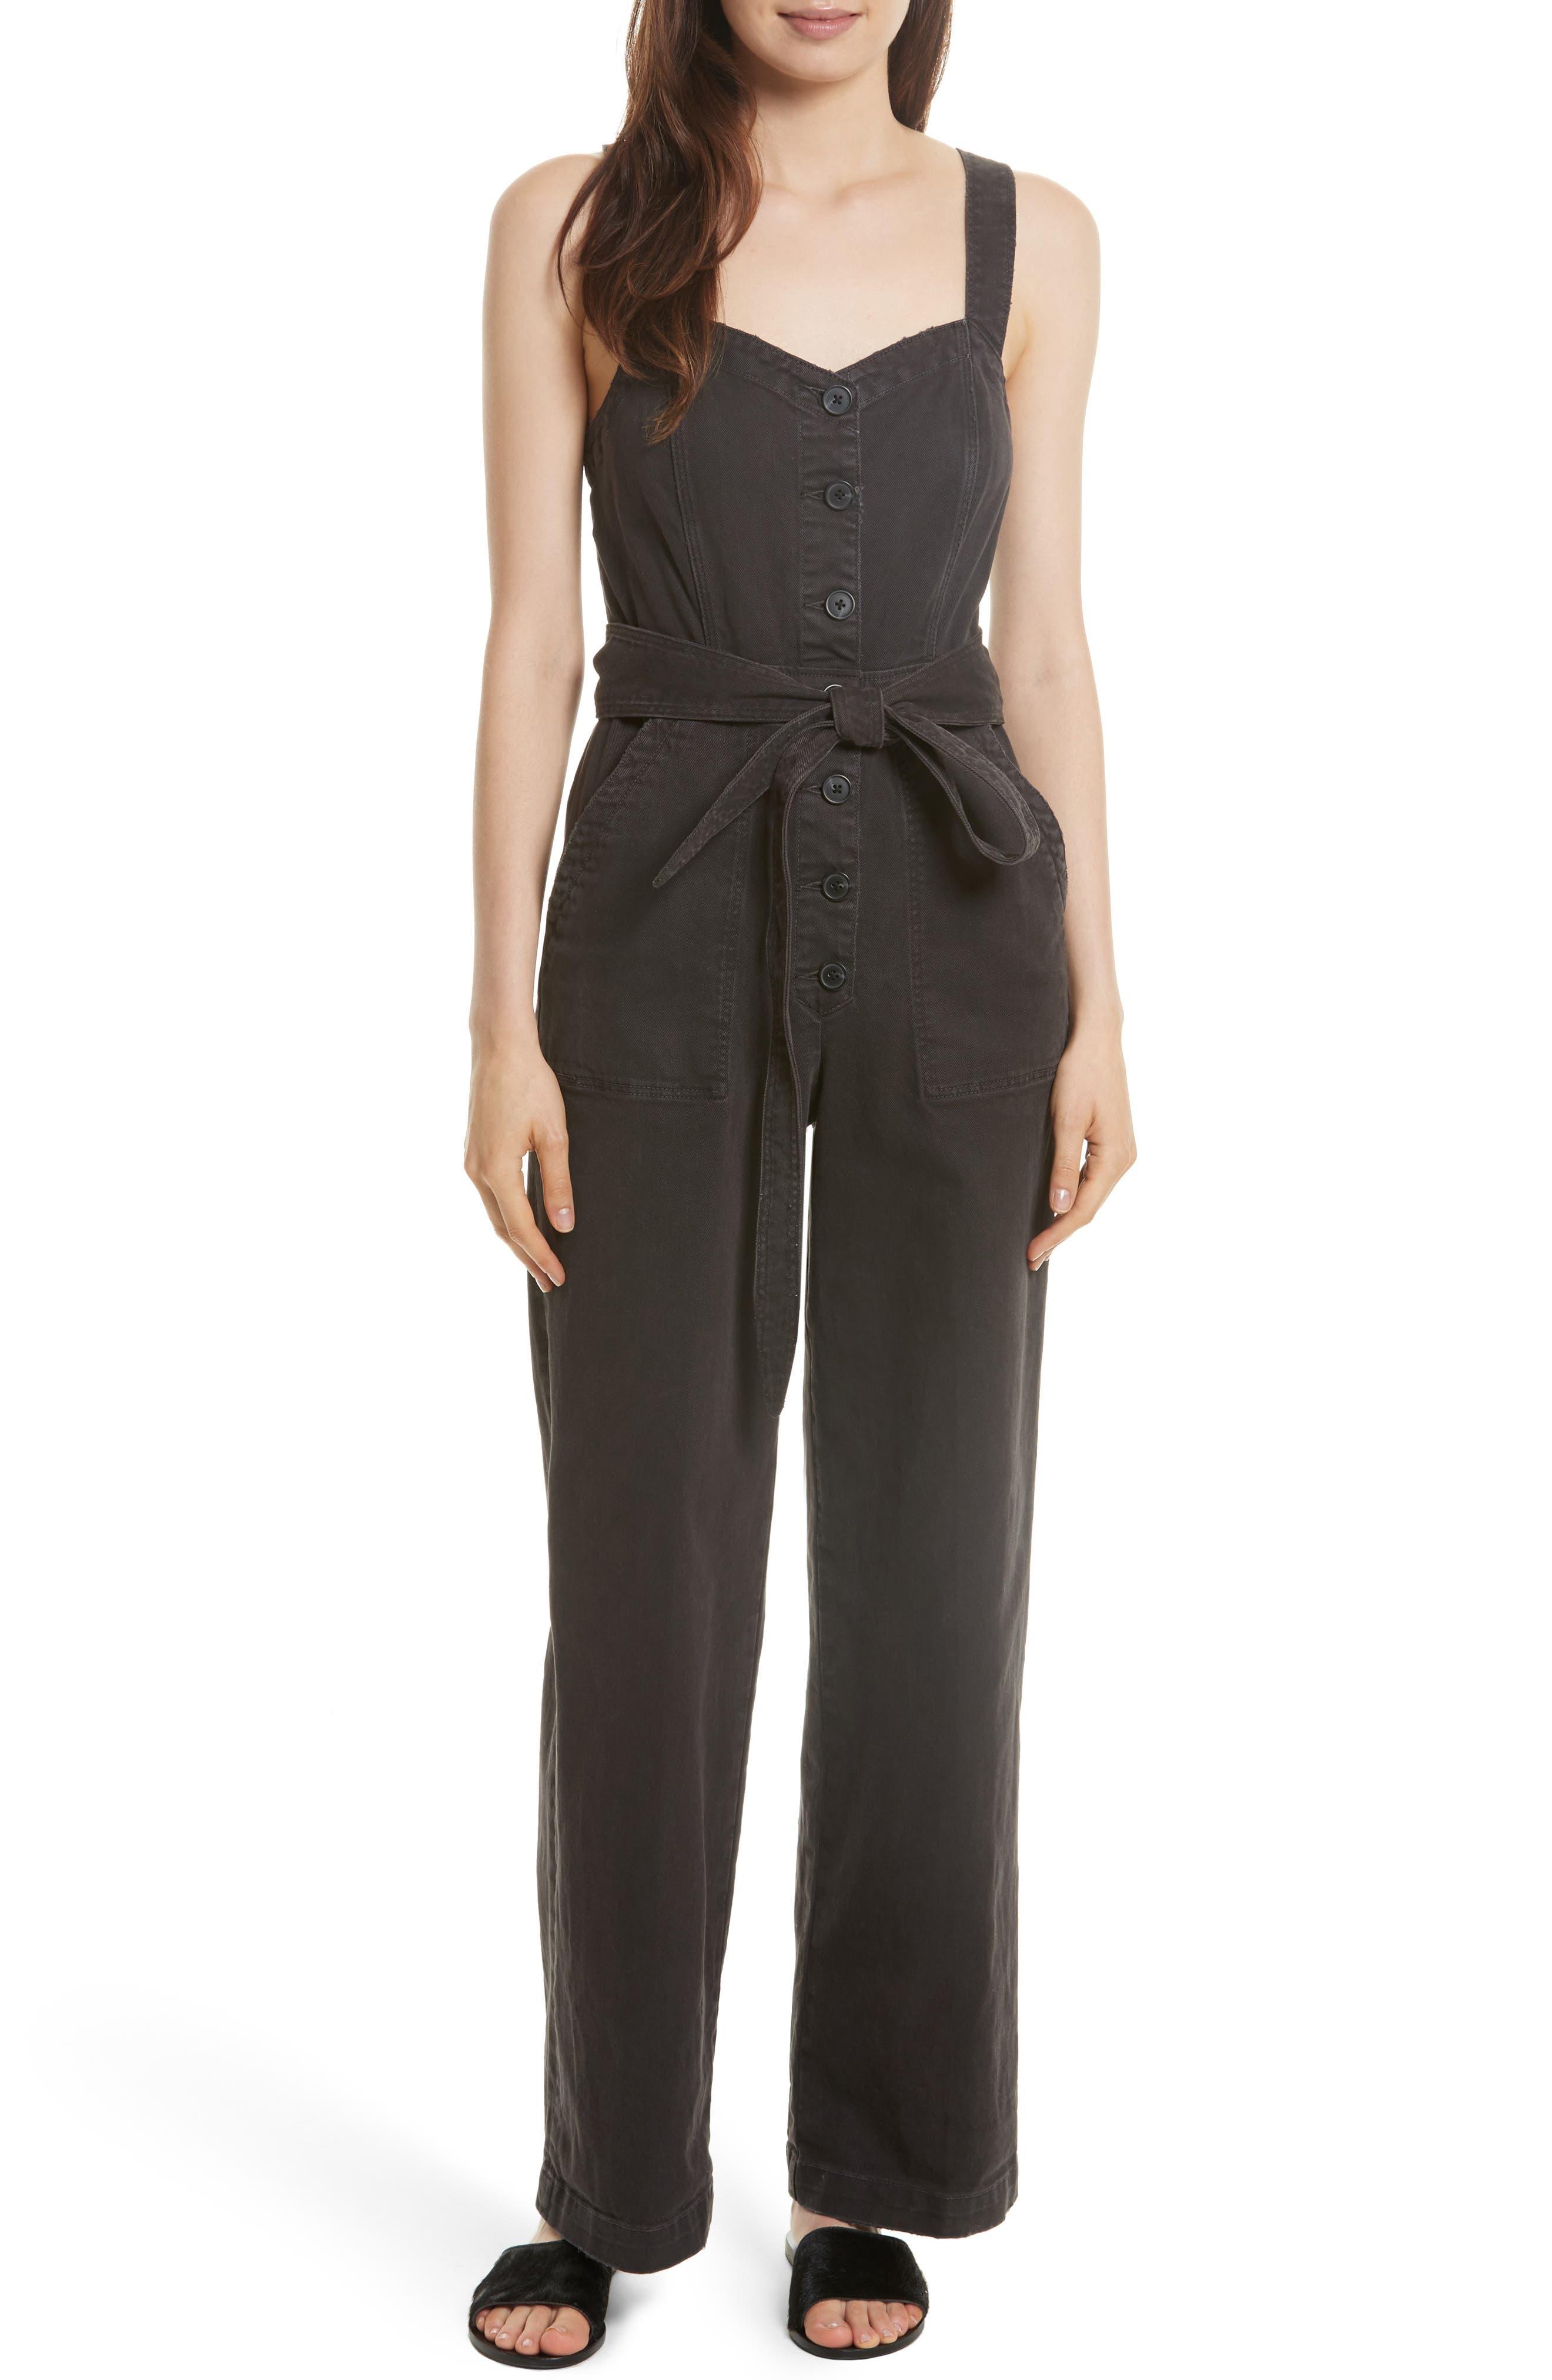 LA VIE REBECCA TAYLOR Garment Dyed Twill Jumpsuit